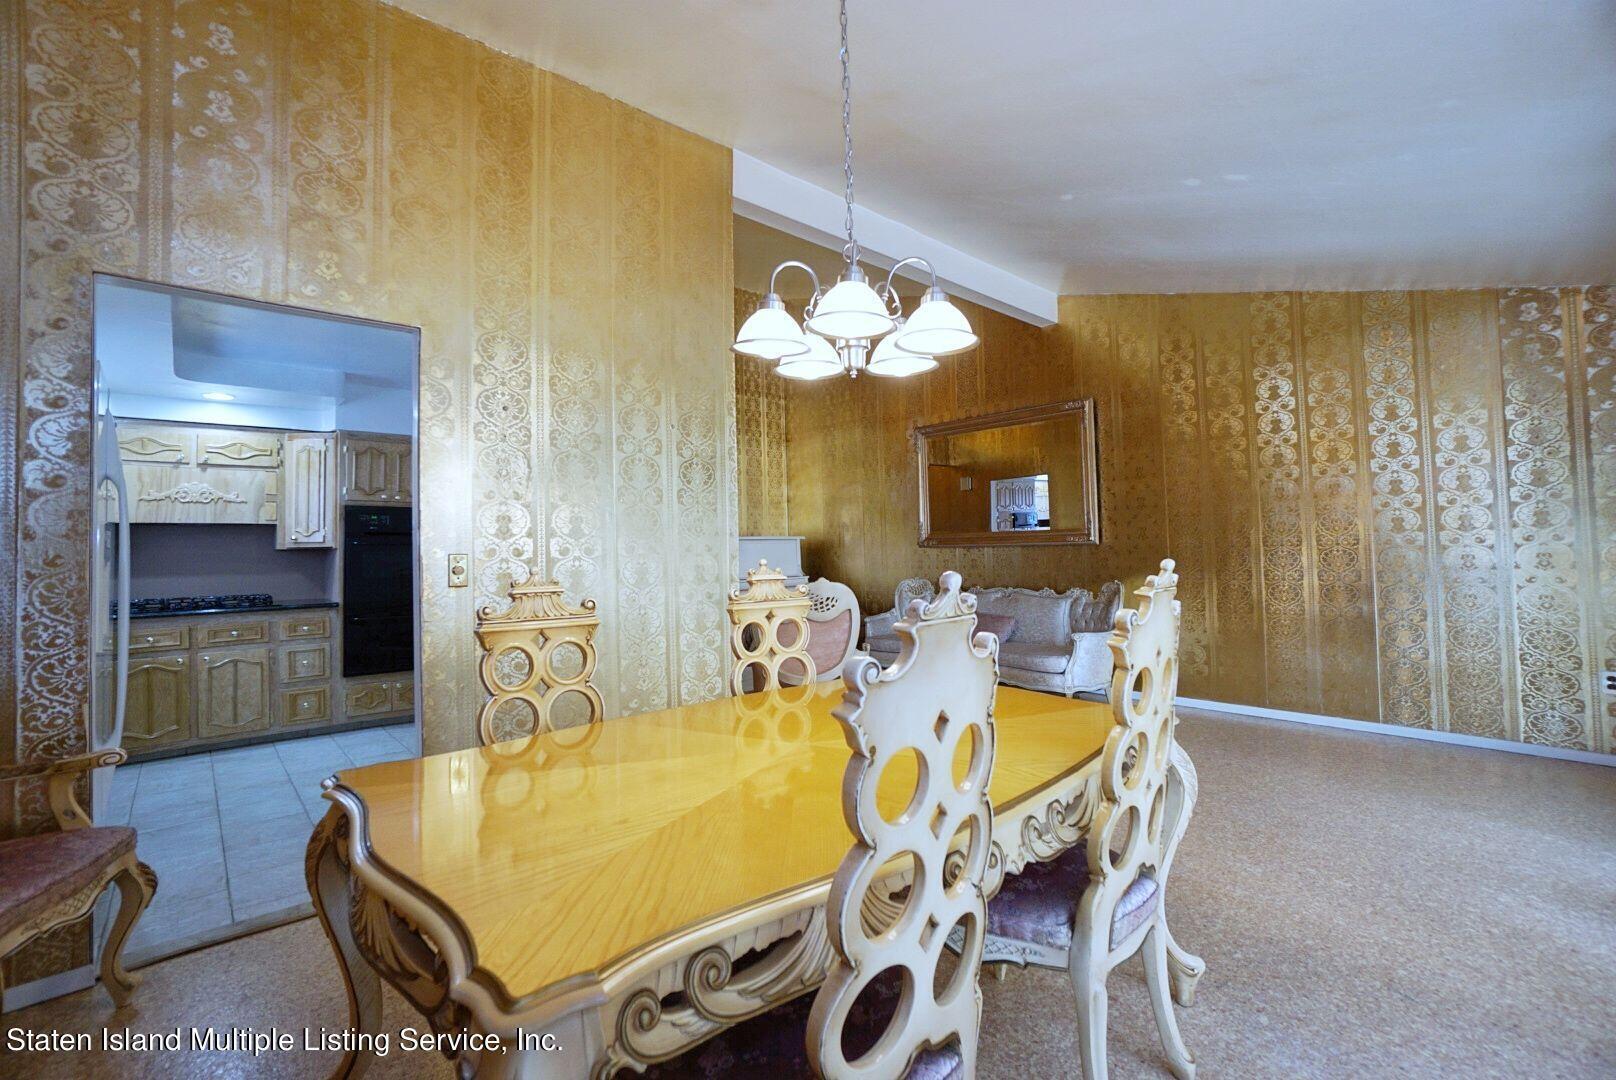 Single Family - Detached 94 Cranford Avenue  Staten Island, NY 10306, MLS-1146620-18